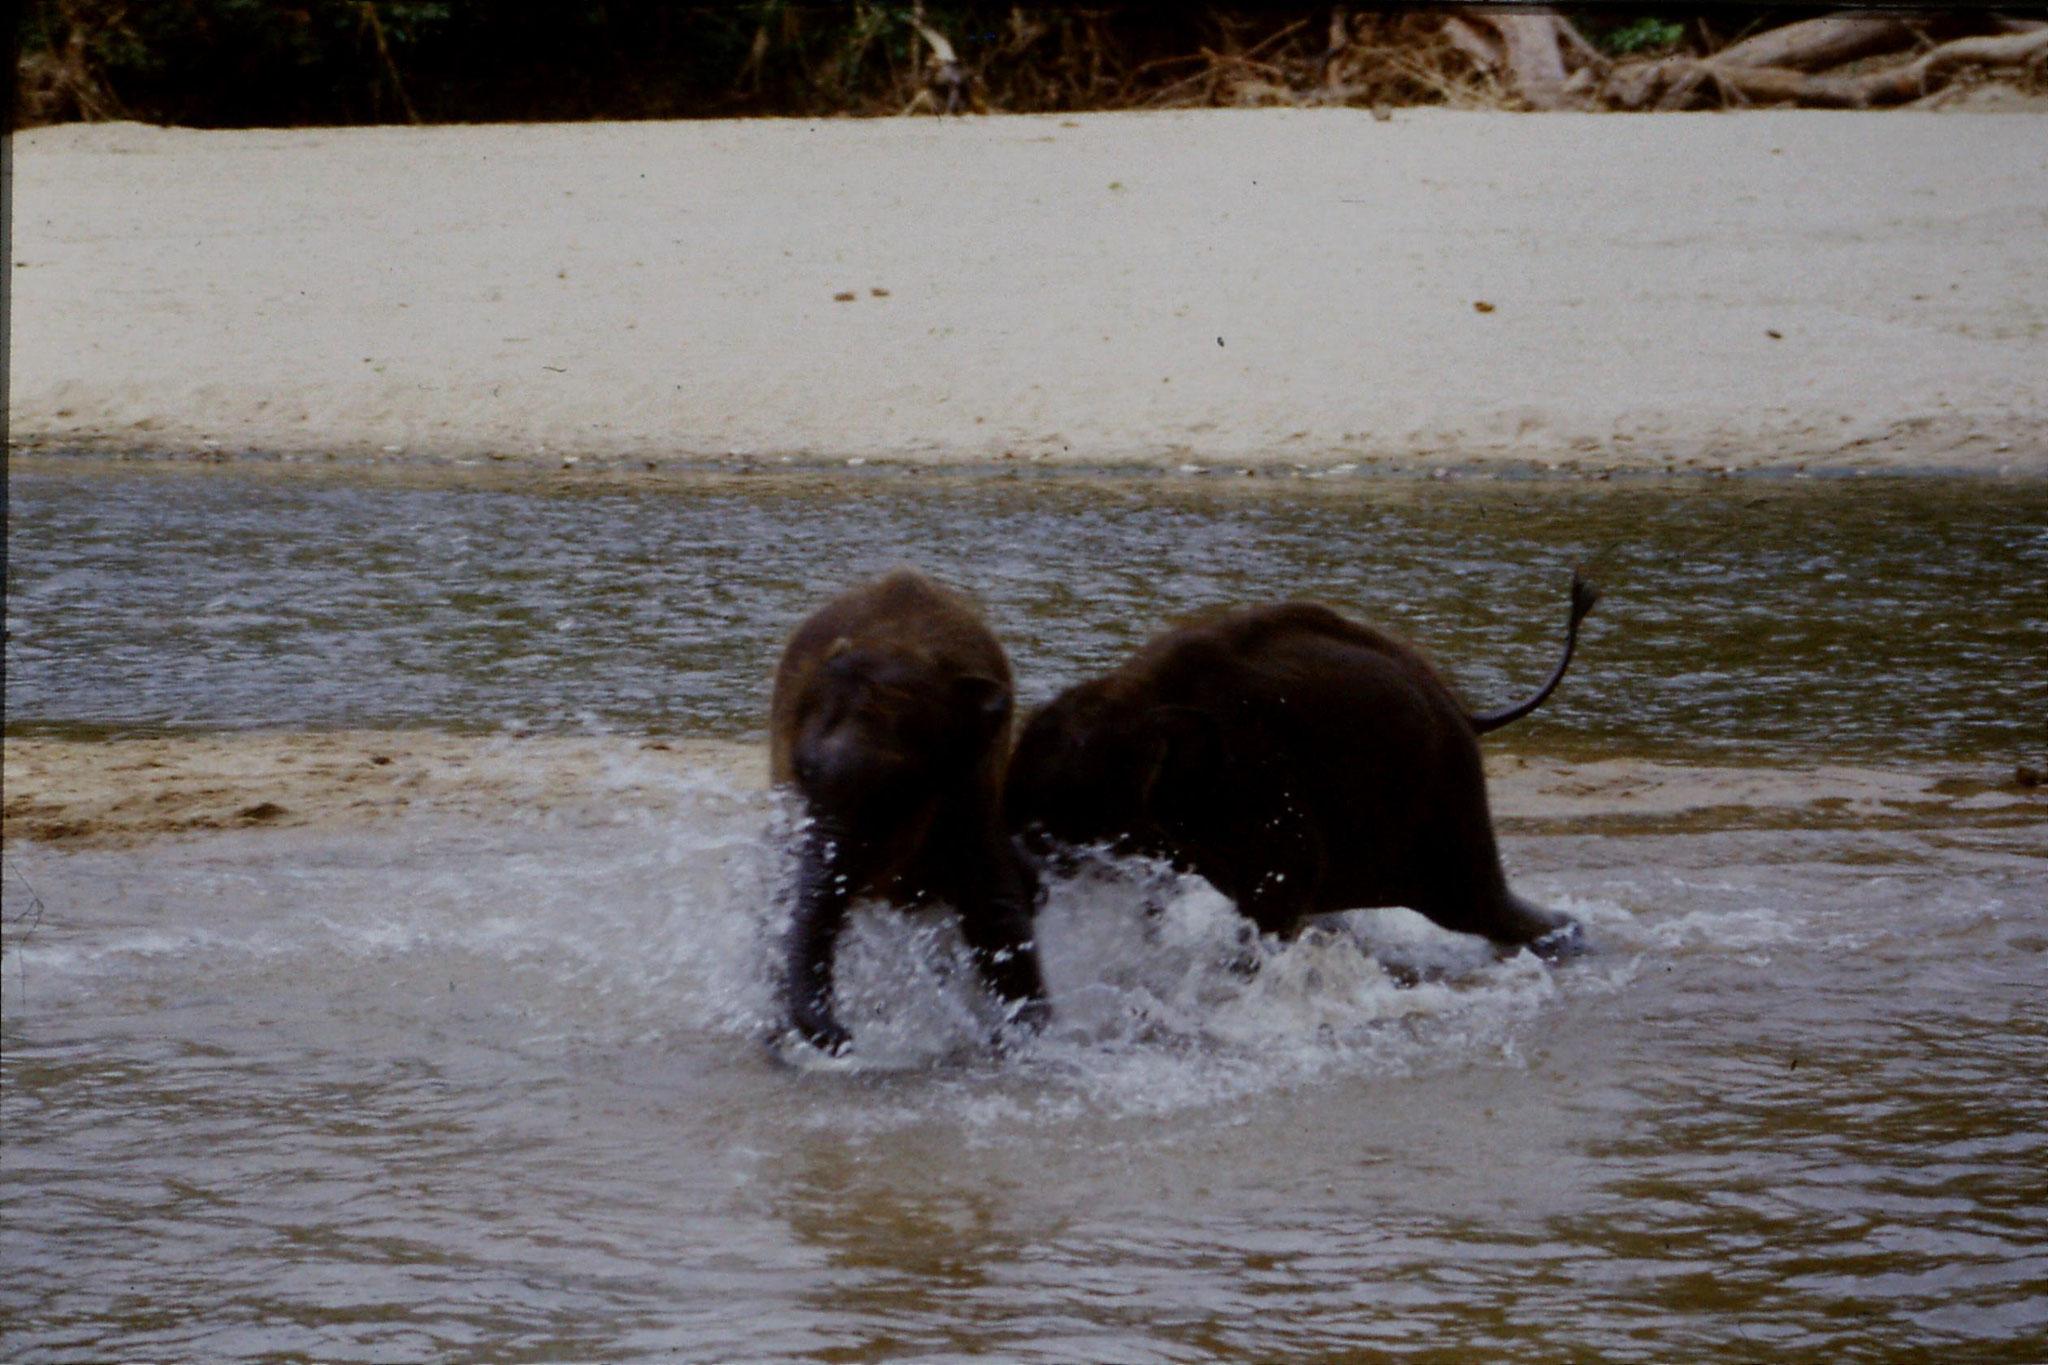 10/2/1990: 15: Kegalla elephant orphanage